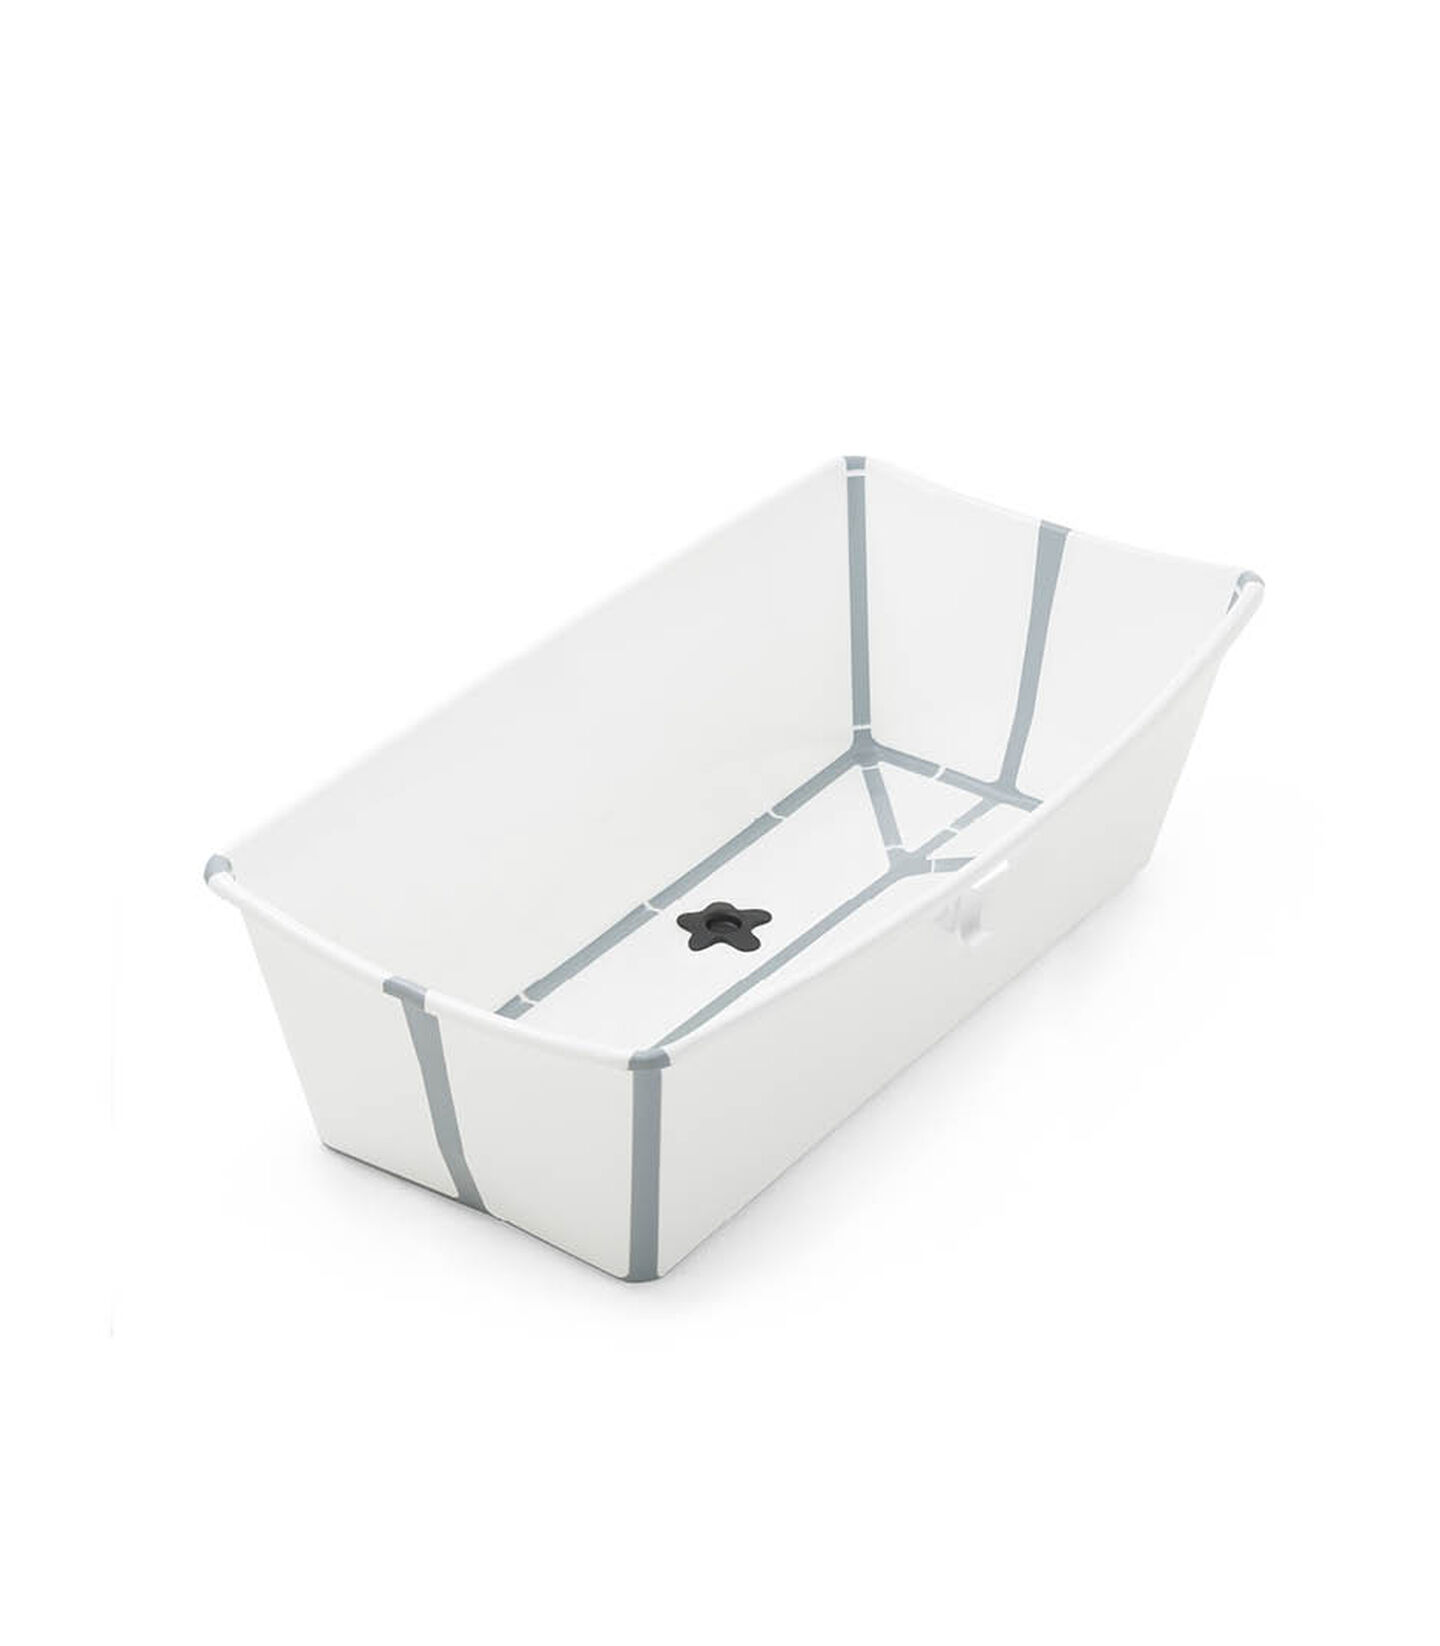 Stokke® Flexi Bath ® Large White, Blanco, mainview view 2